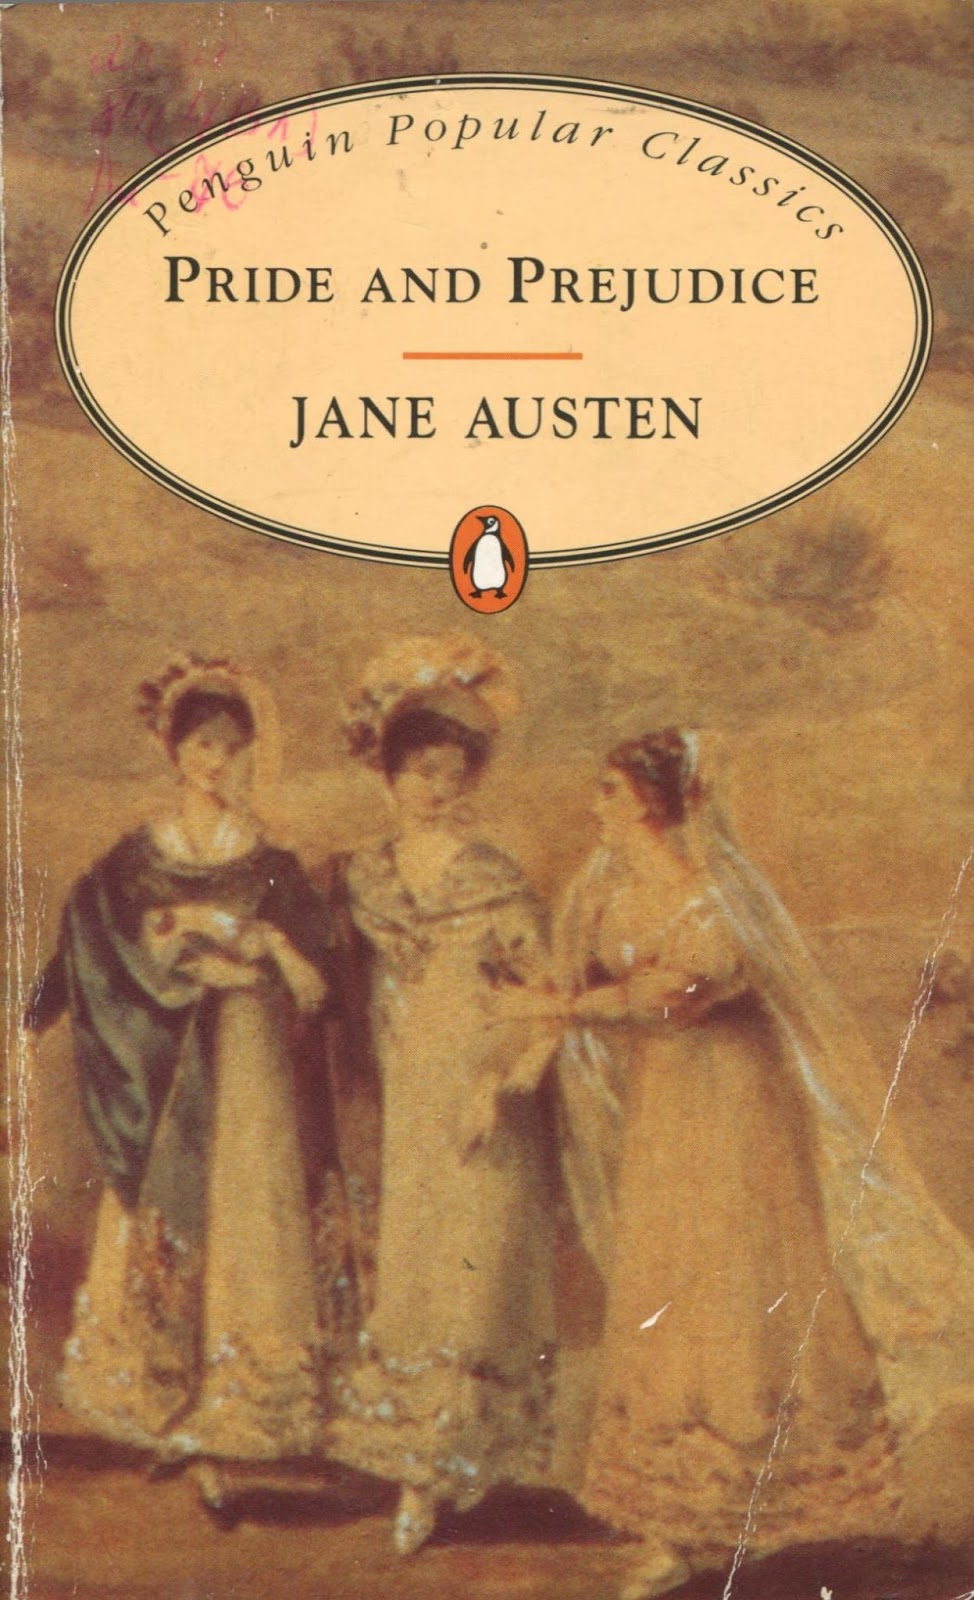 jane austen s use humour her novel pride and prejudice